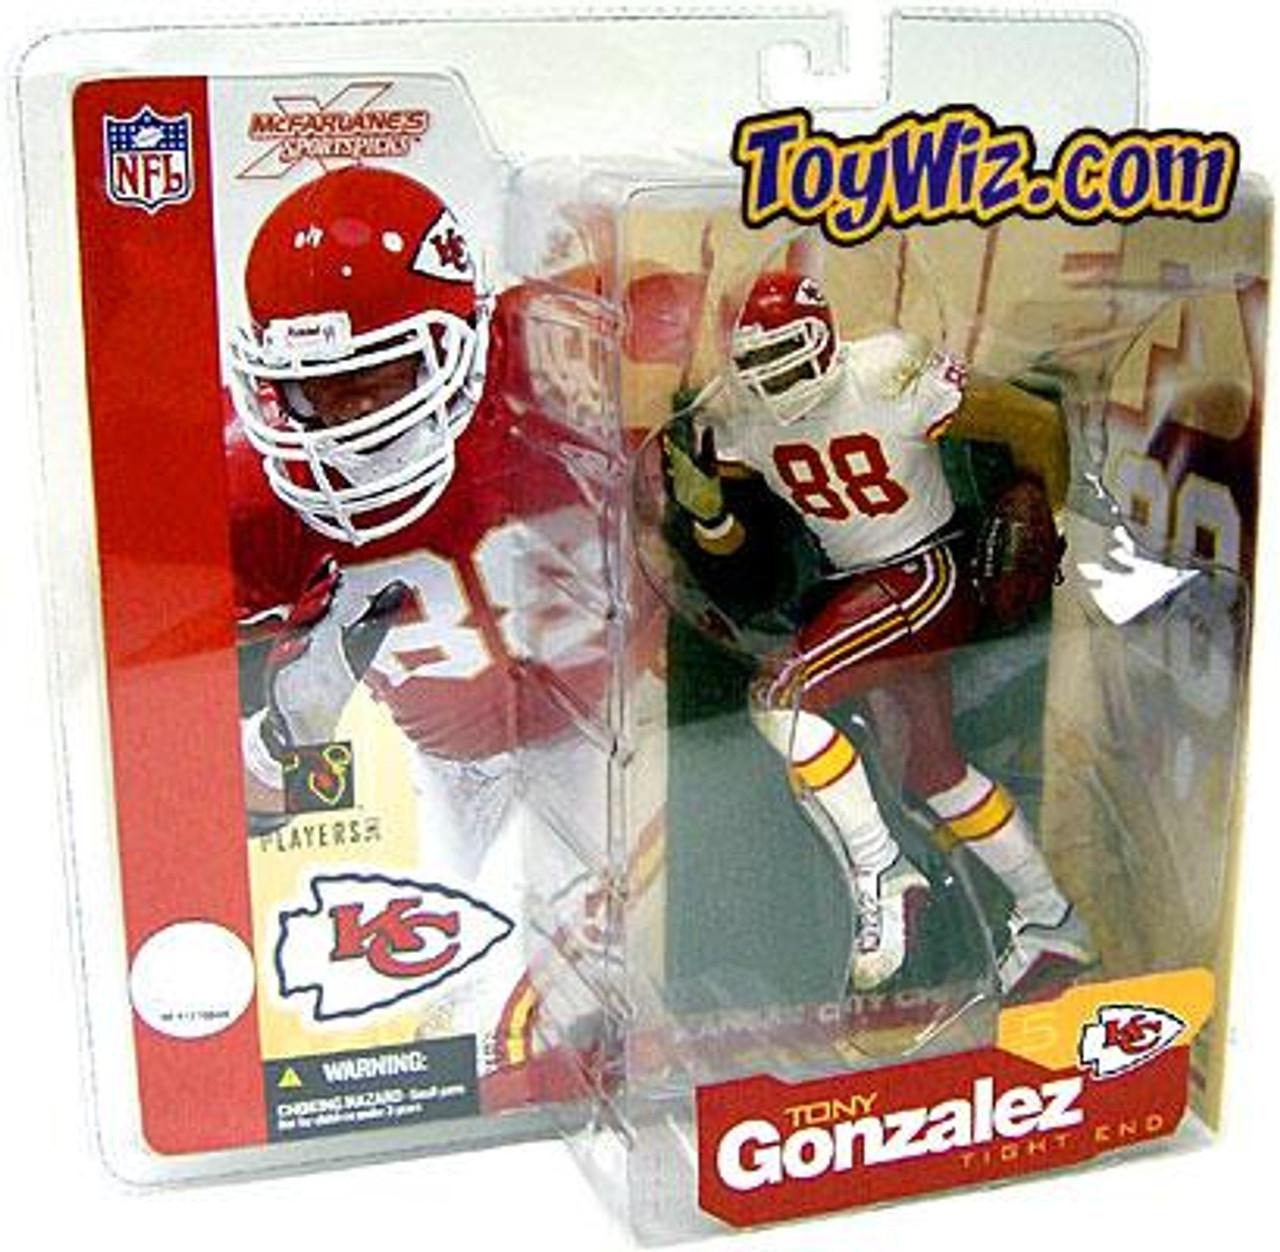 McFarlane Toys NFL Kansas City Chiefs Sports Picks Series 5 Tony Gonzalez Action Figure [White Jersey Variant]